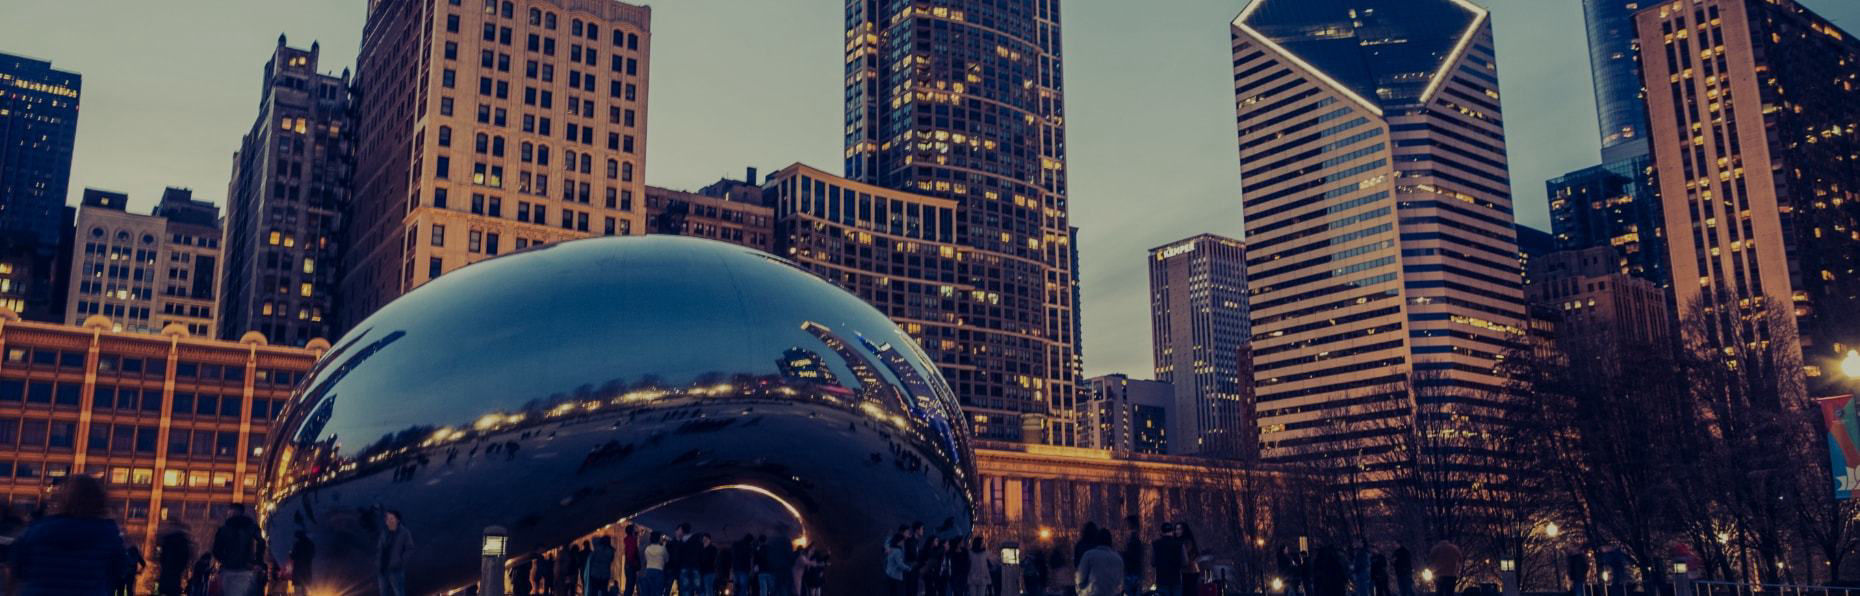 app development company chicago image